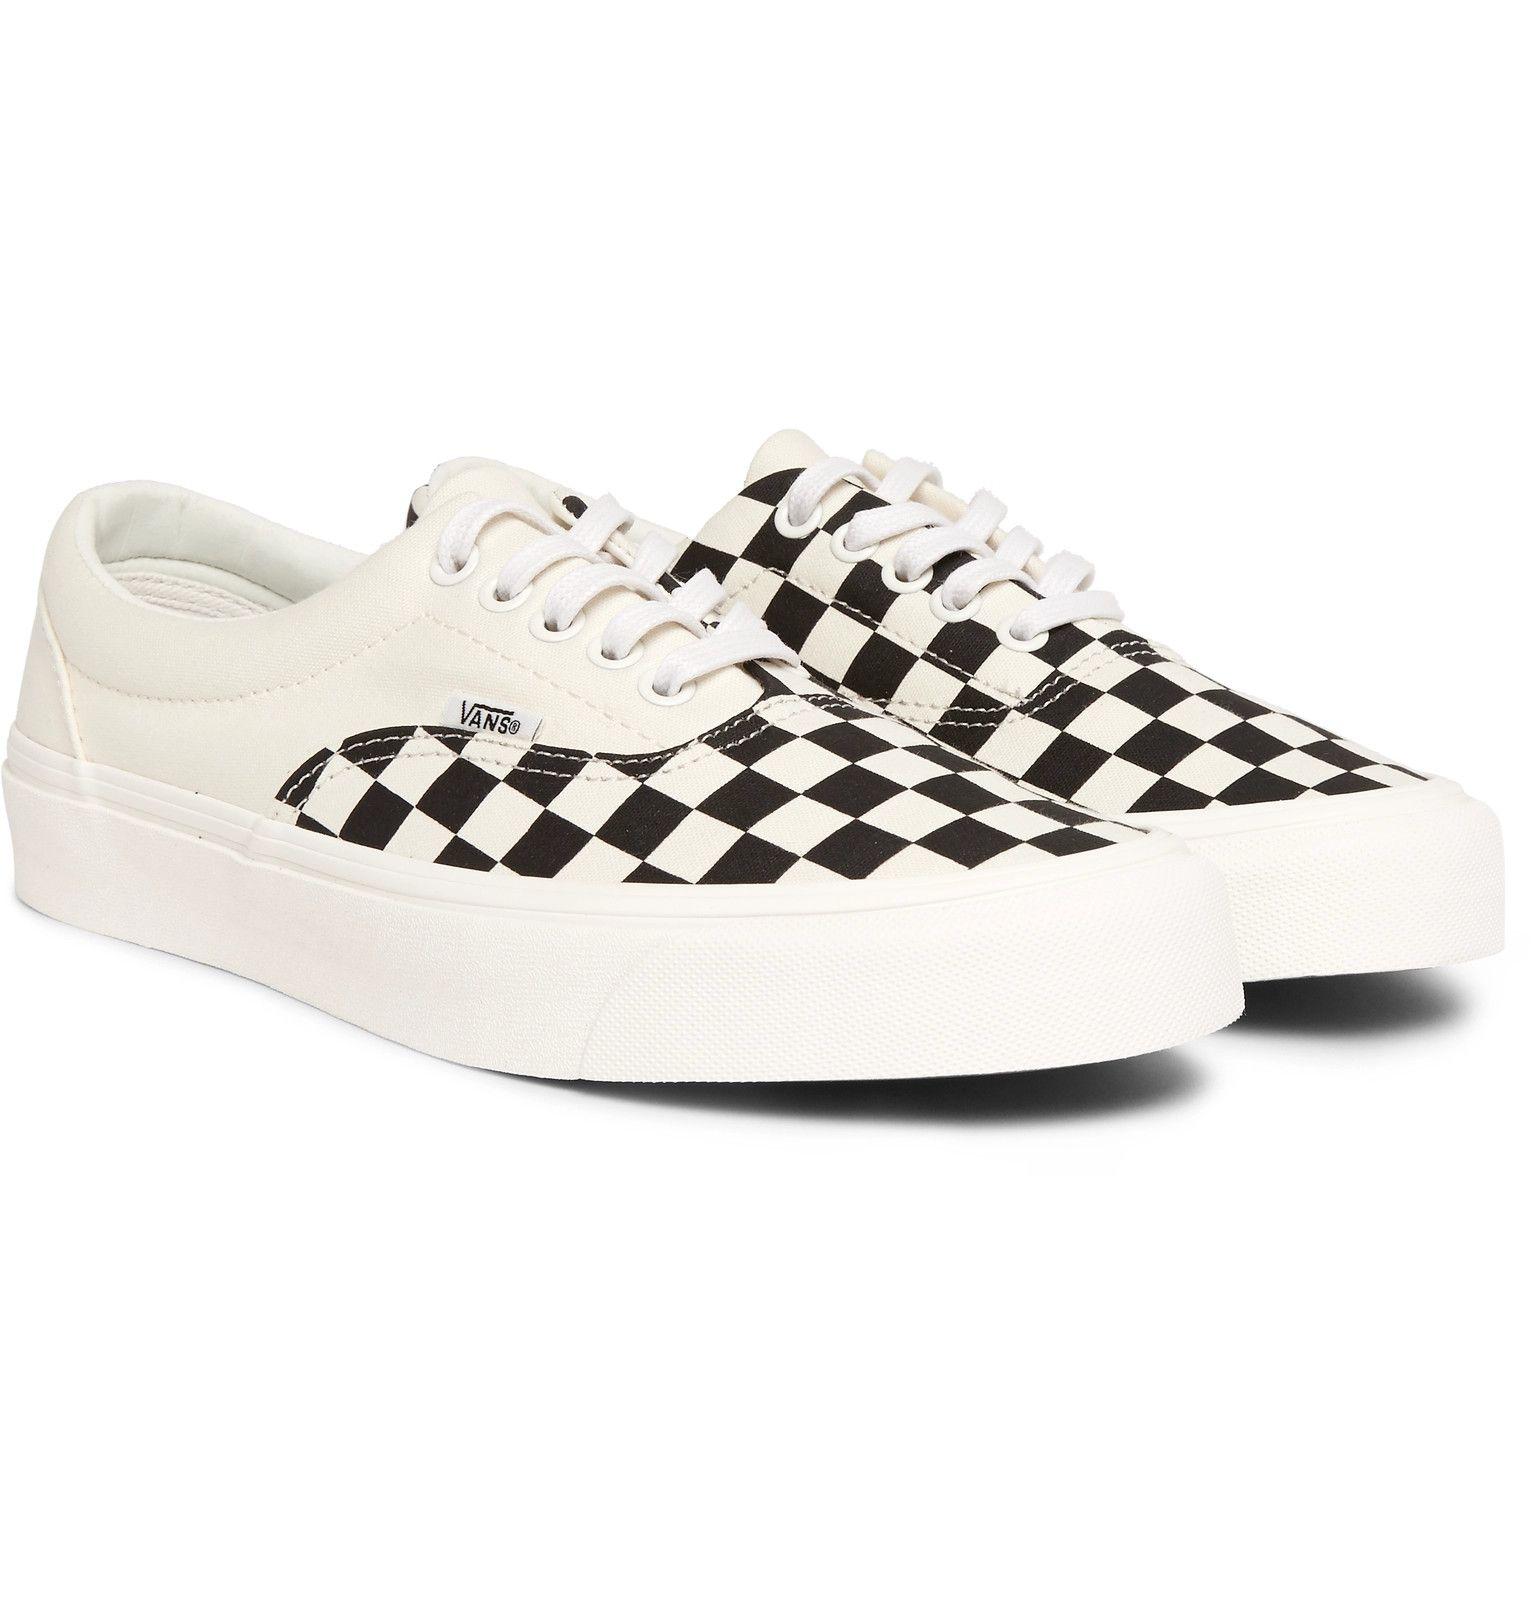 Canvas sneakers men, Vans, Sneakers